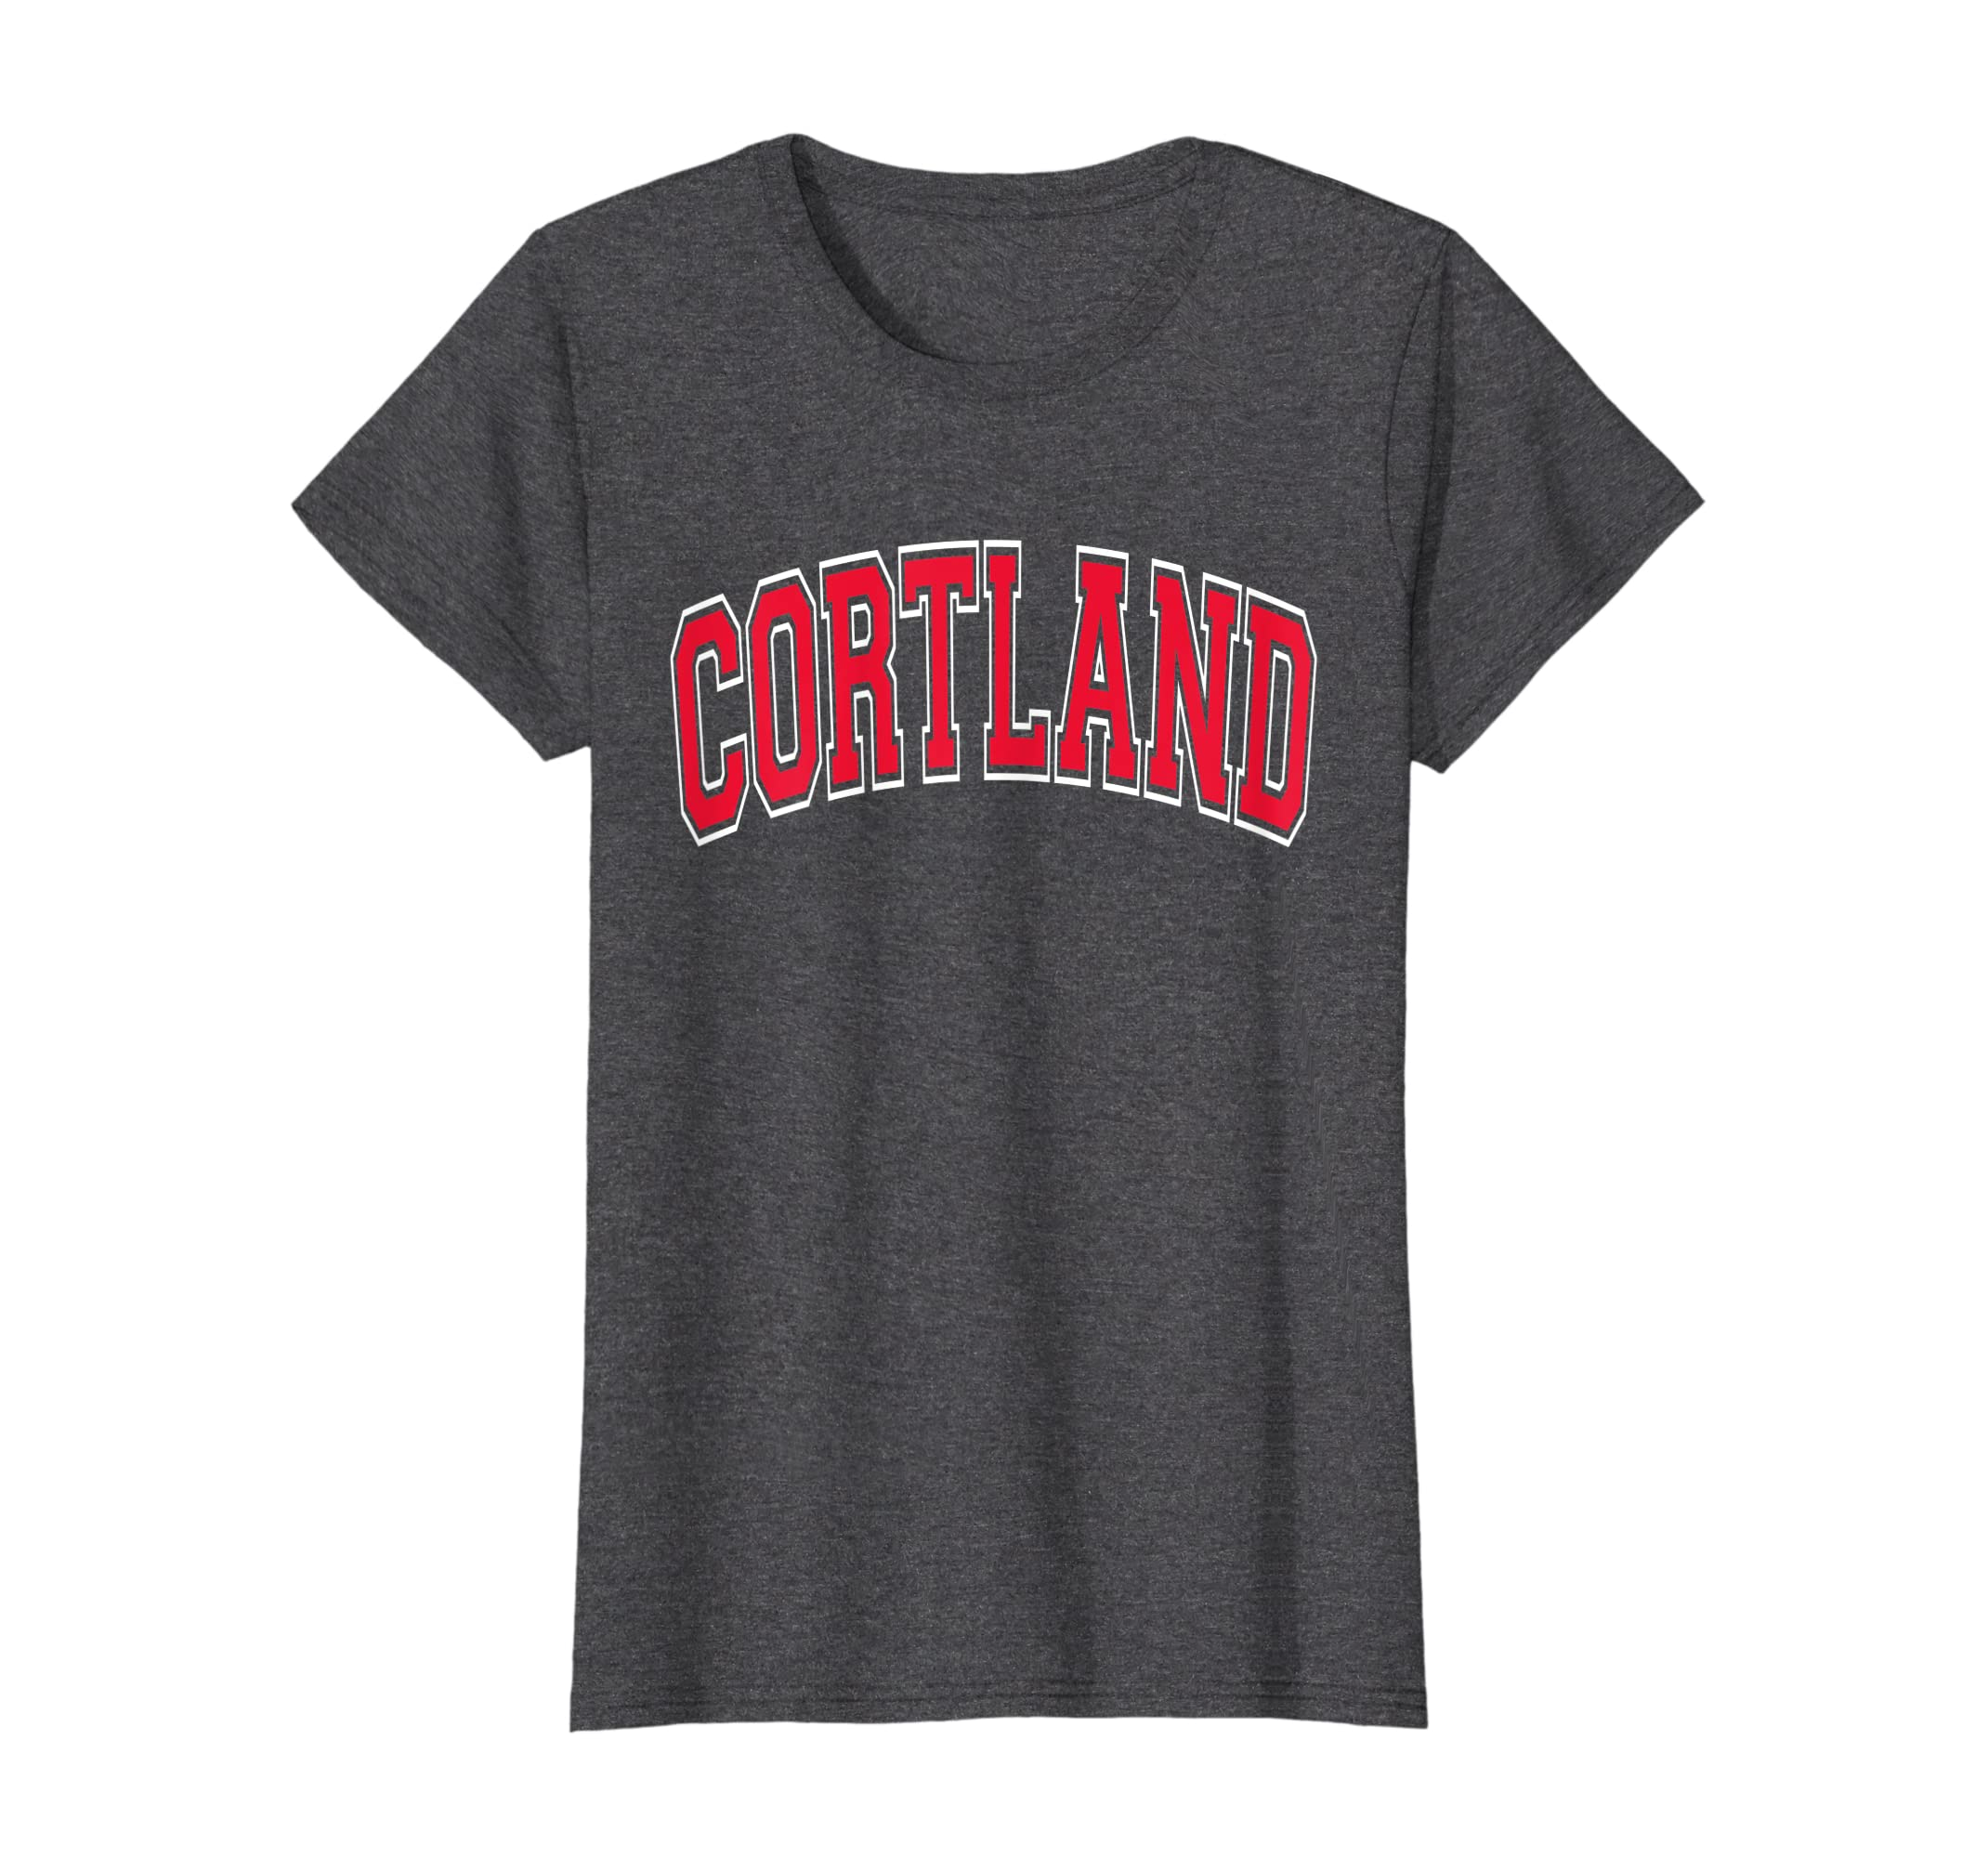 Cortland Tshirt NY – Varsity Style Red Print-Loveshirt